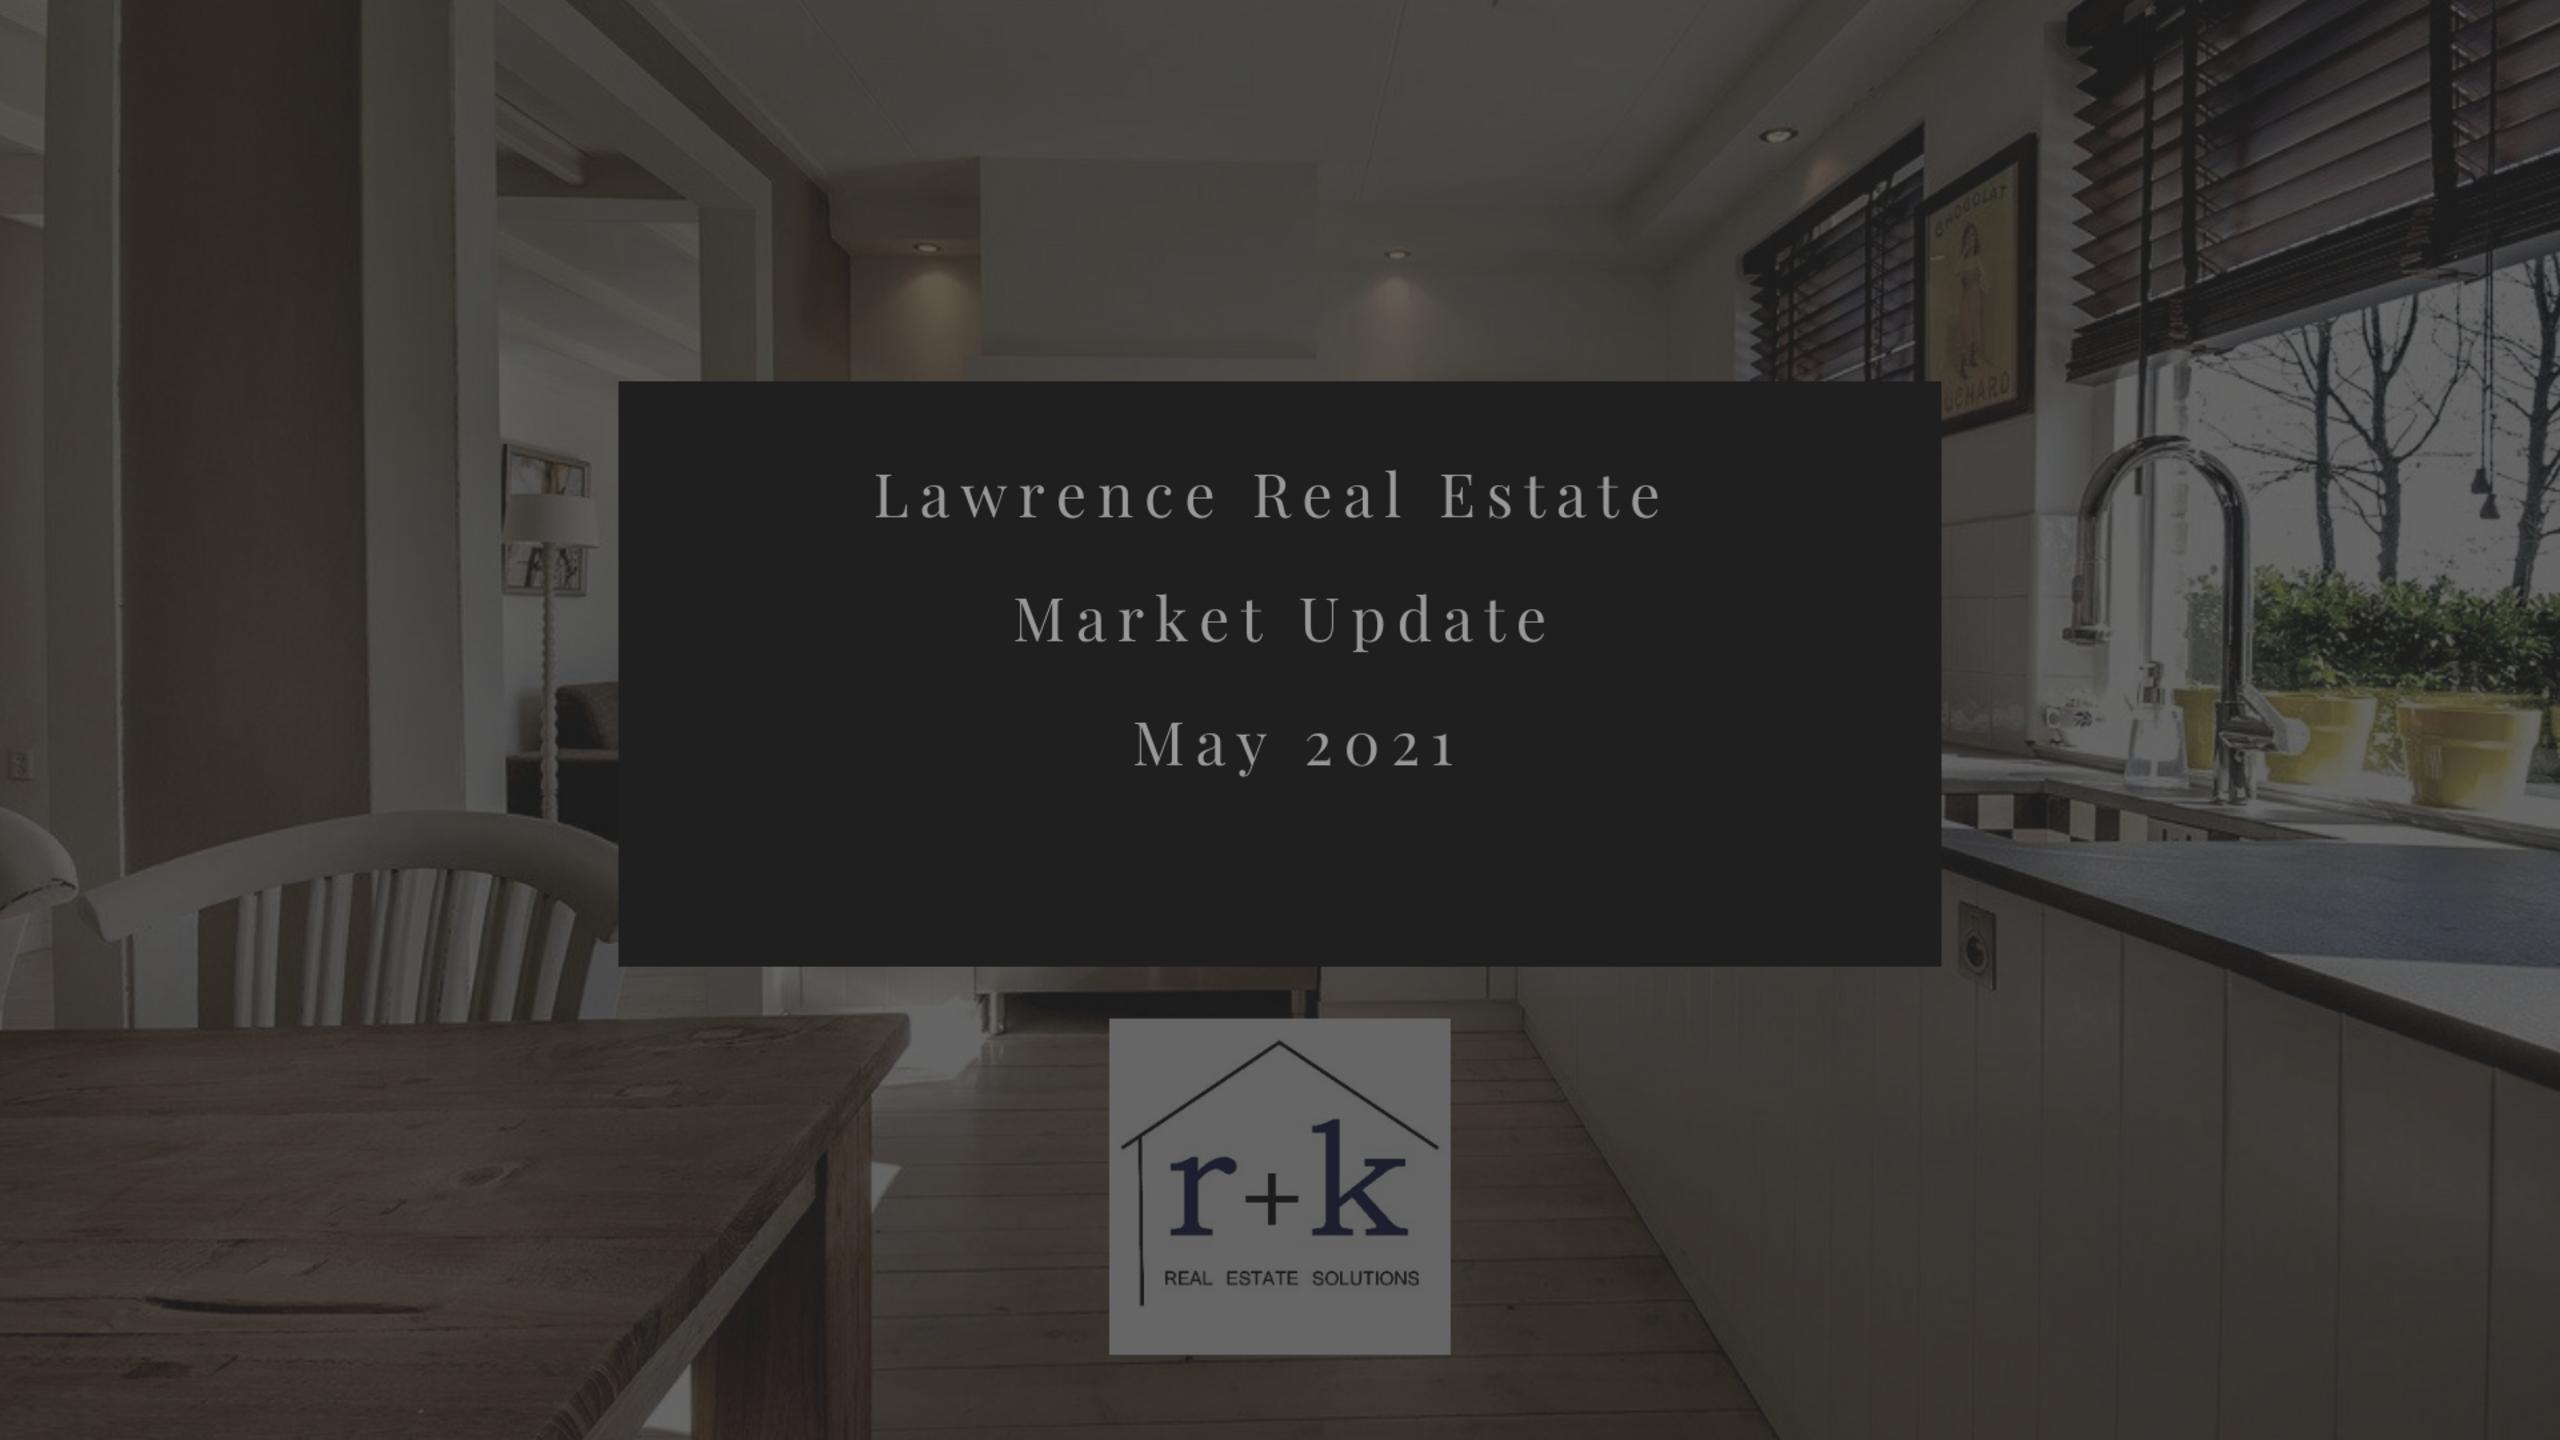 Market Update May 2021